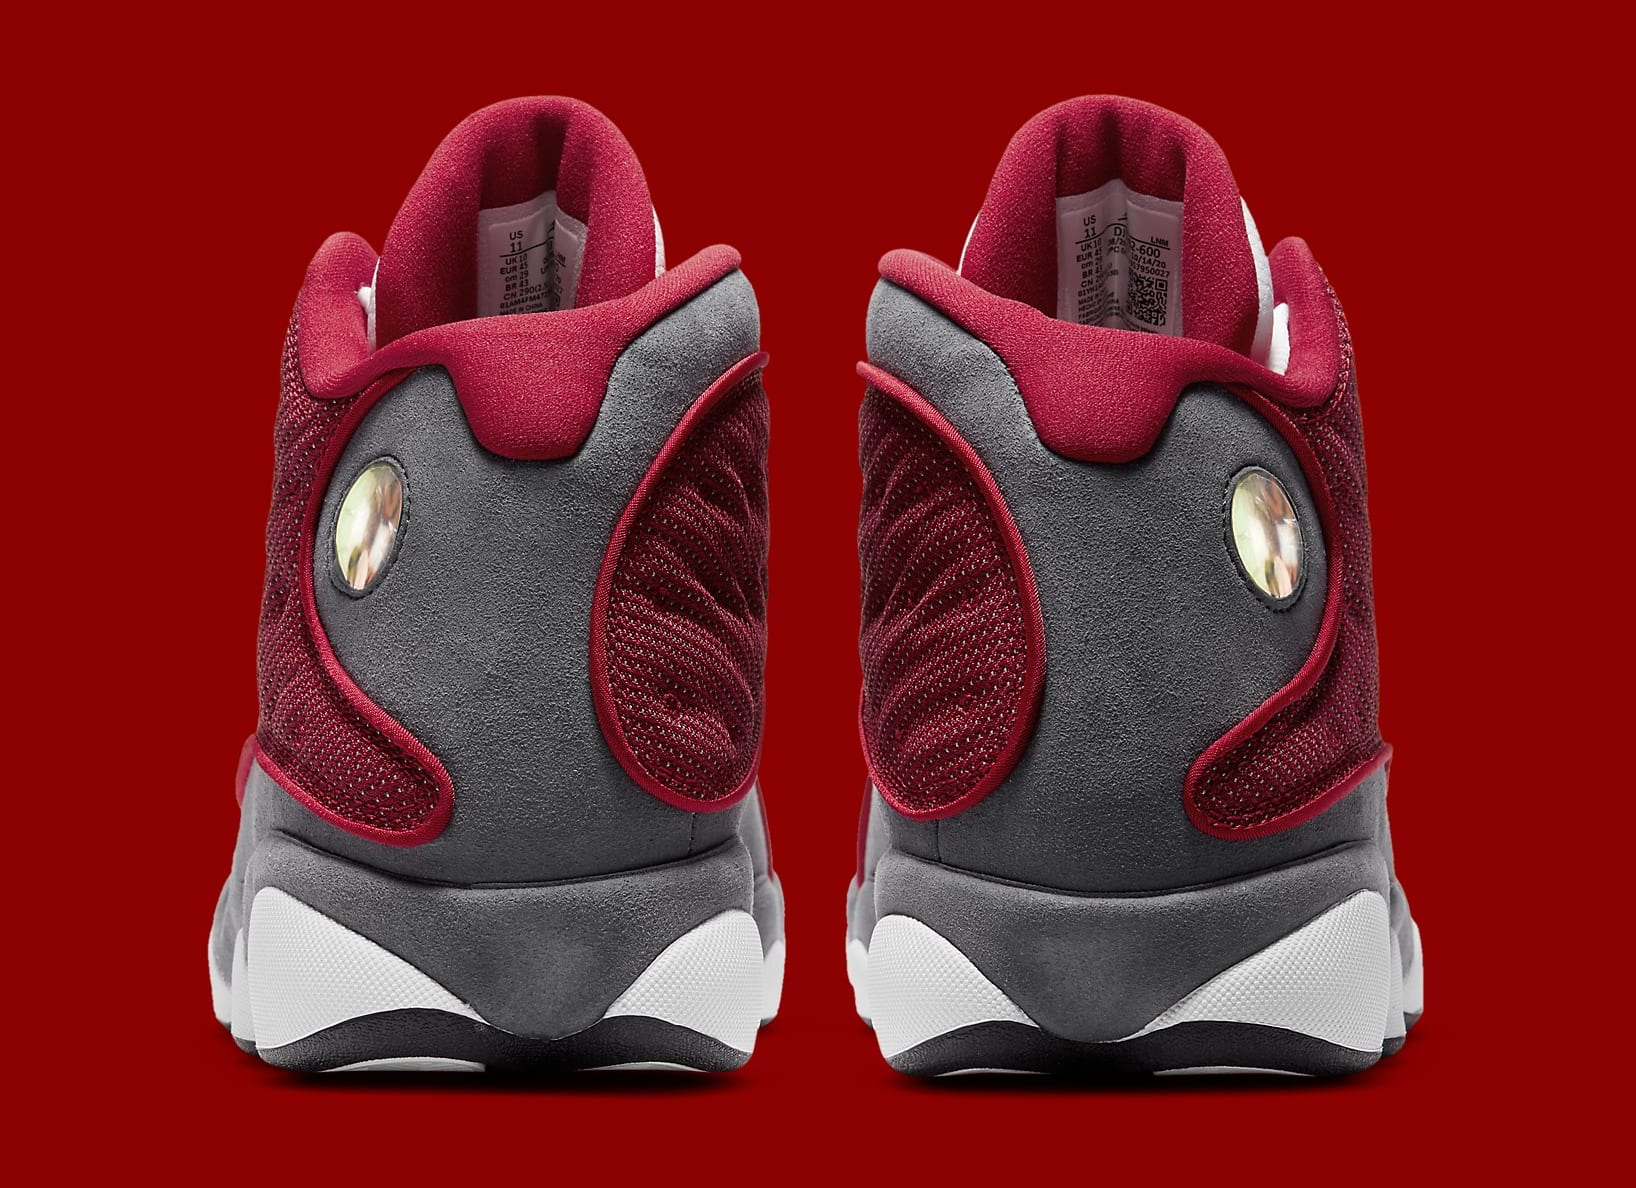 Air Jordan 13 Retro 'Gym Red' DJ5982-600 Heel